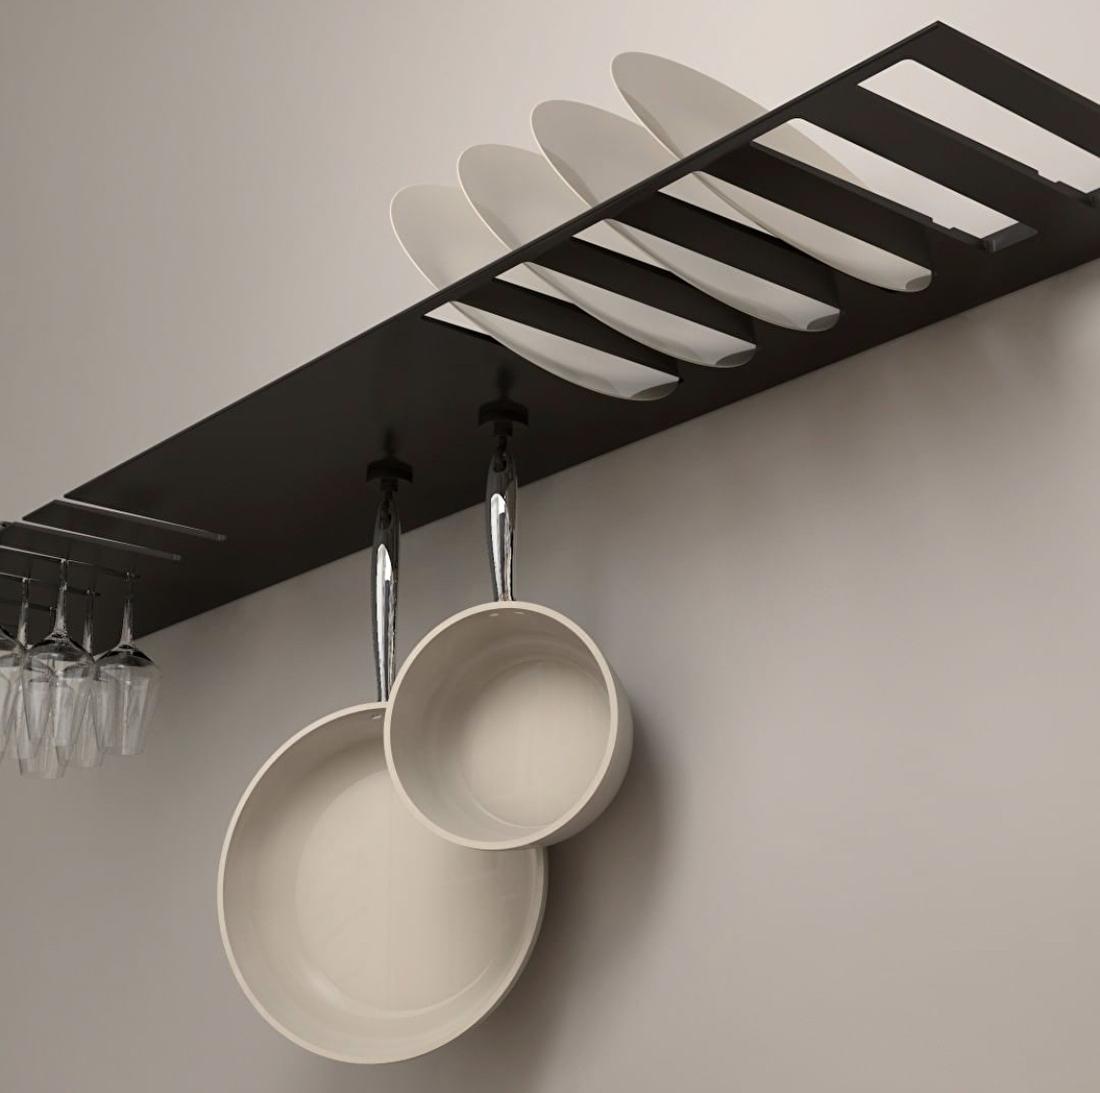 Strackk keuken wandplank the big easy kitchen